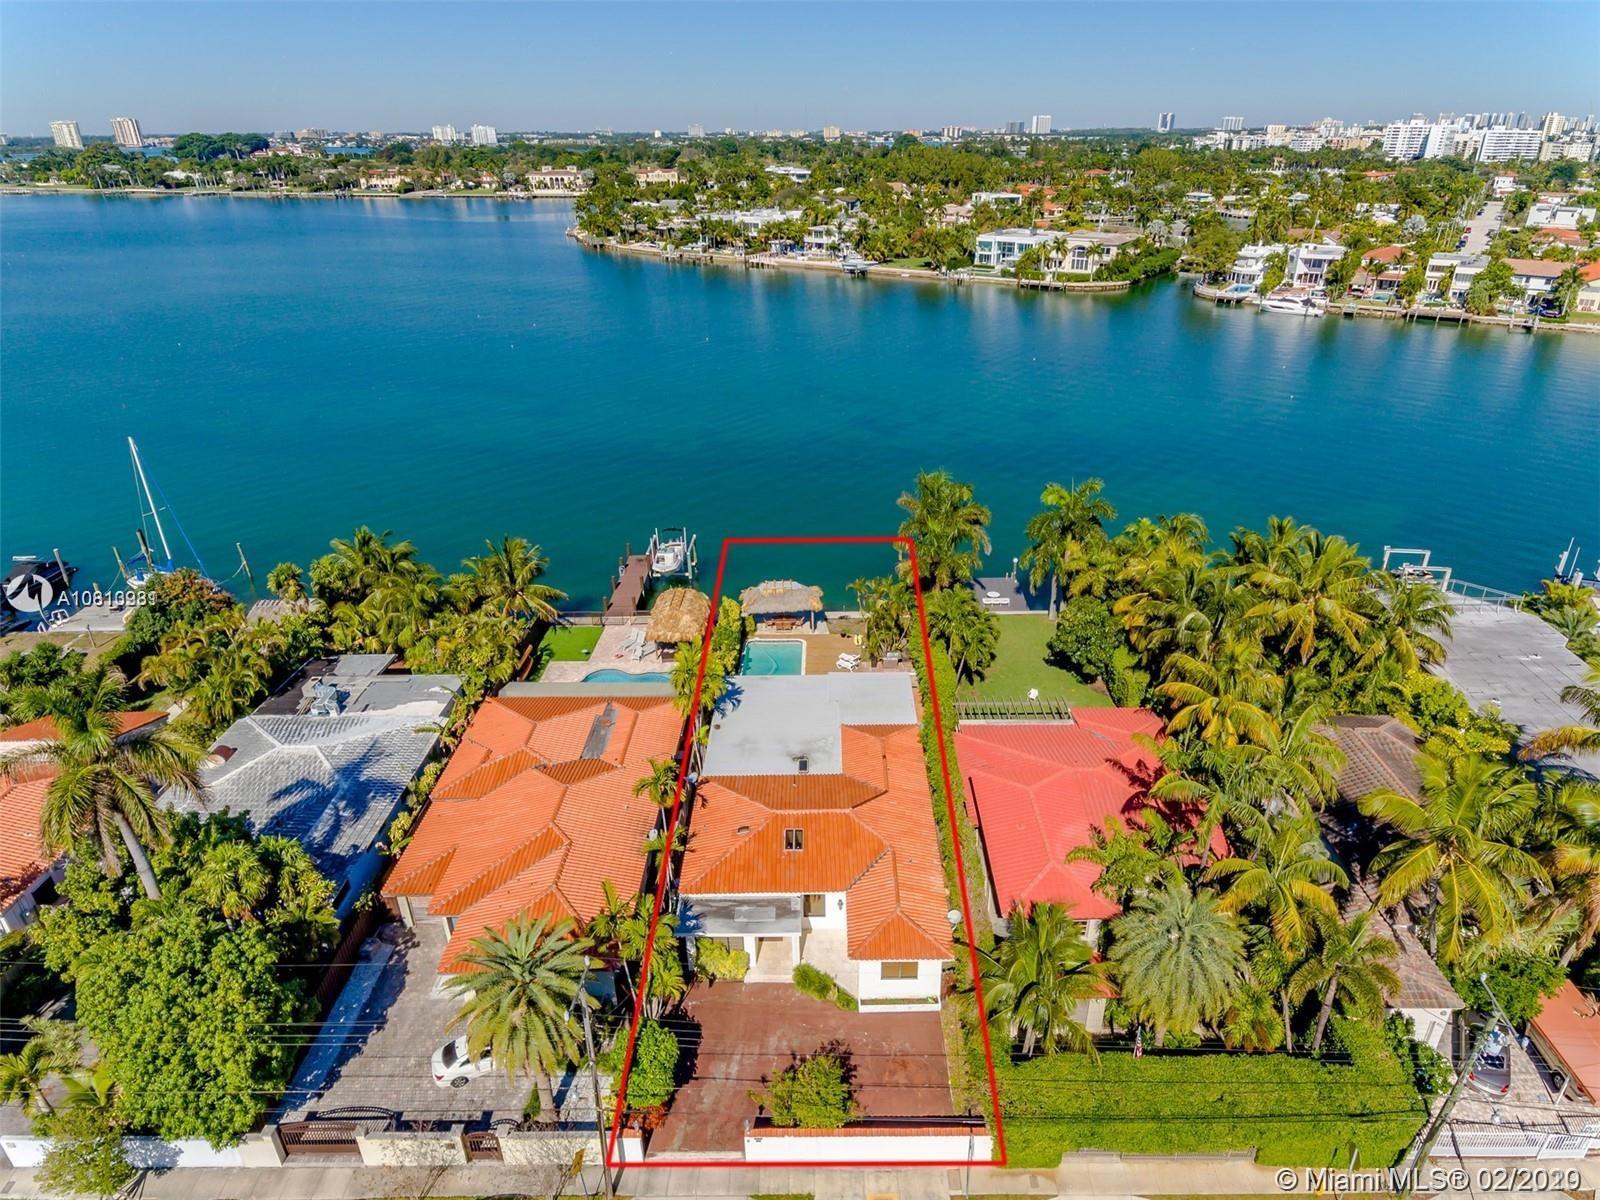 901 Stillwater Dr, Miami Beach, FL 33141 - Miami Beach, FL real estate listing